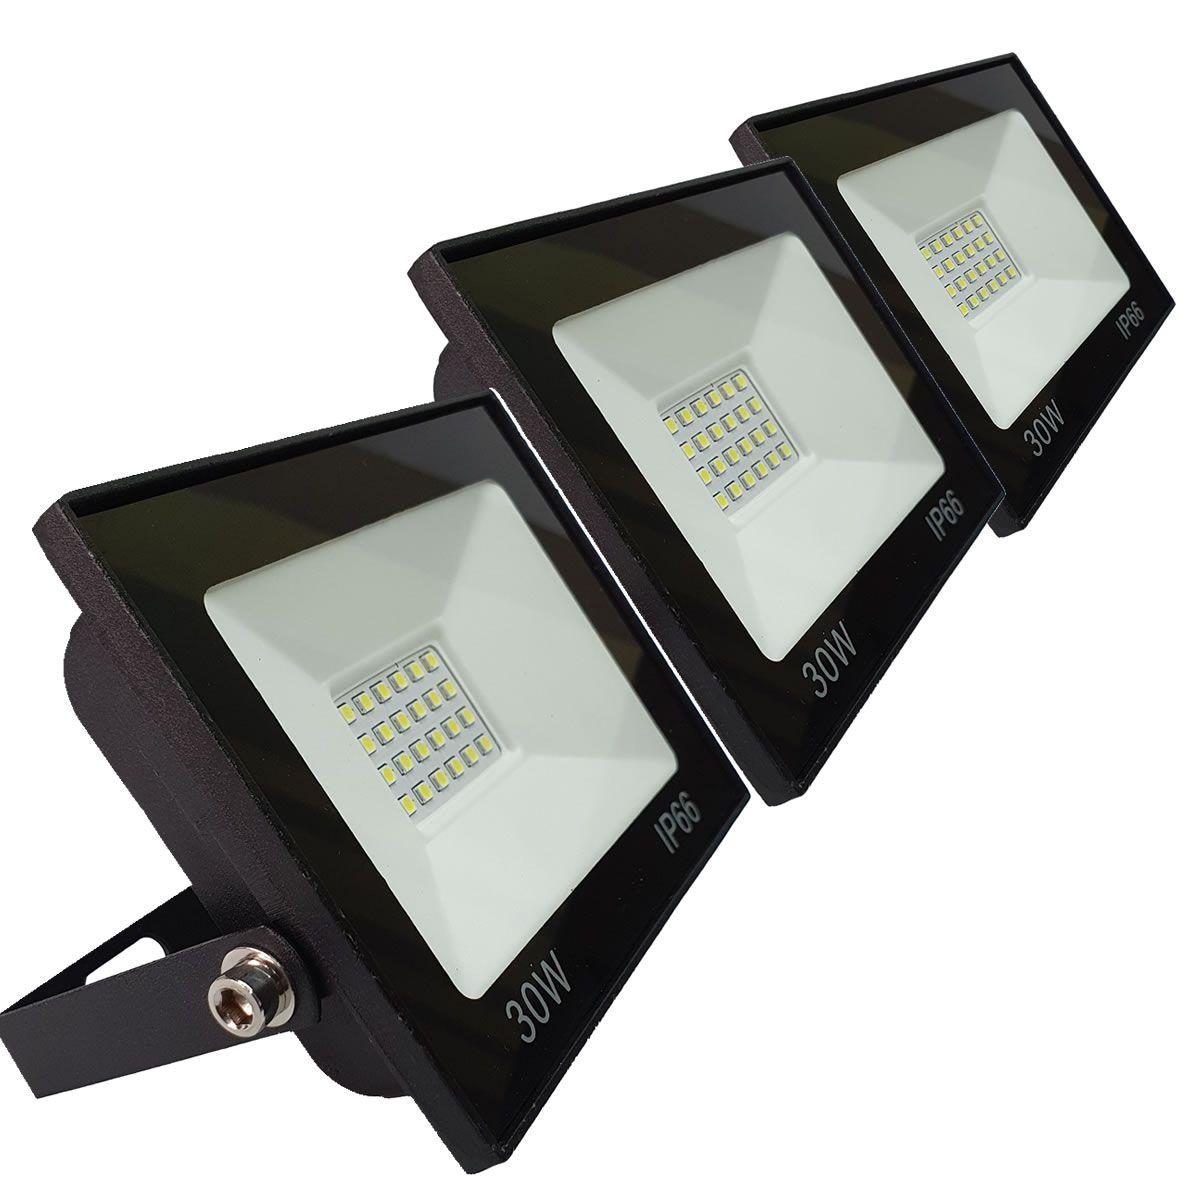 KIT 3 refletor 30w LED SMD Holofote Bivolt Externo Luz Branca